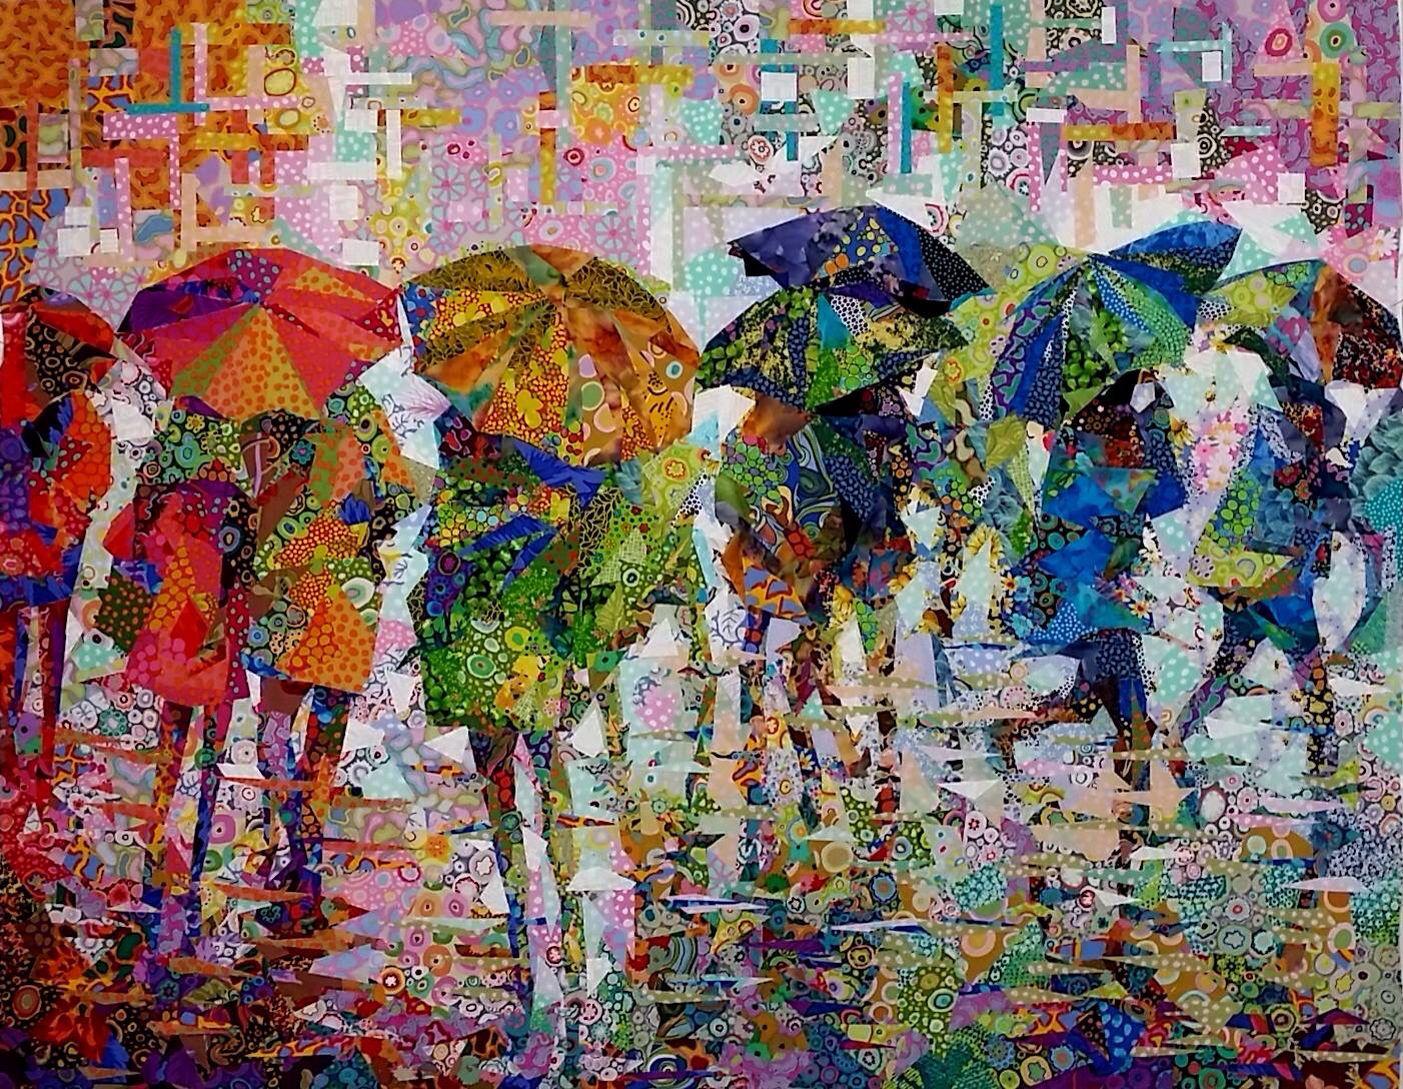 Rain Ii Danny Amazonas Art Quilts Pinterest Rain